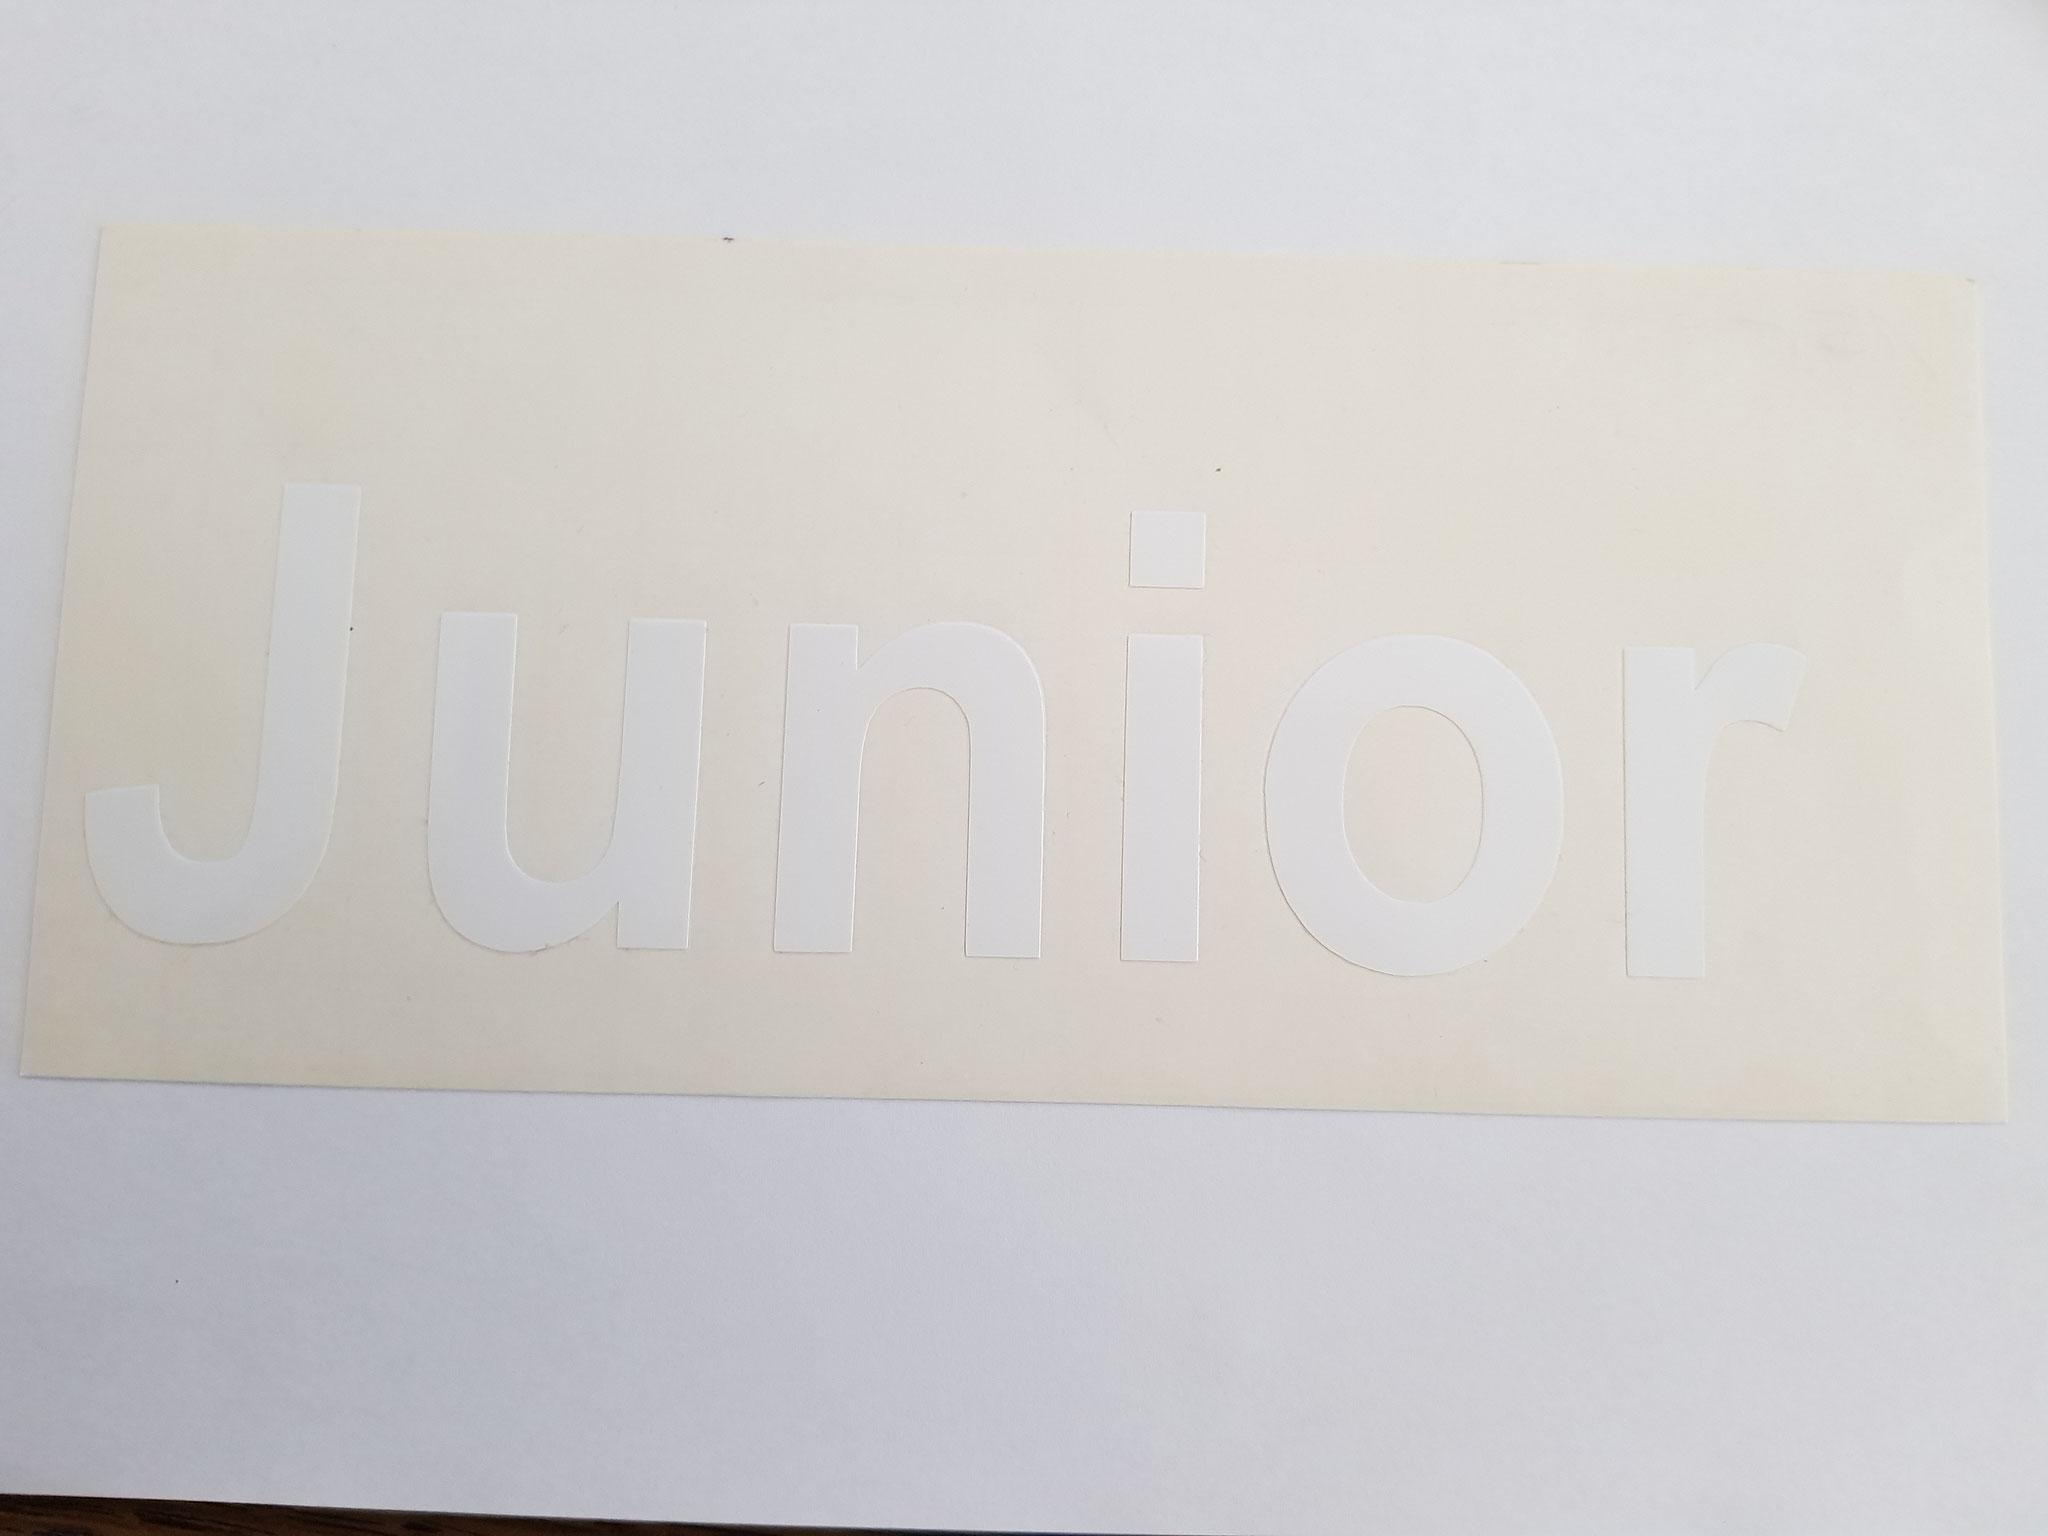 Schilter junior Kleber ab Mai 2020